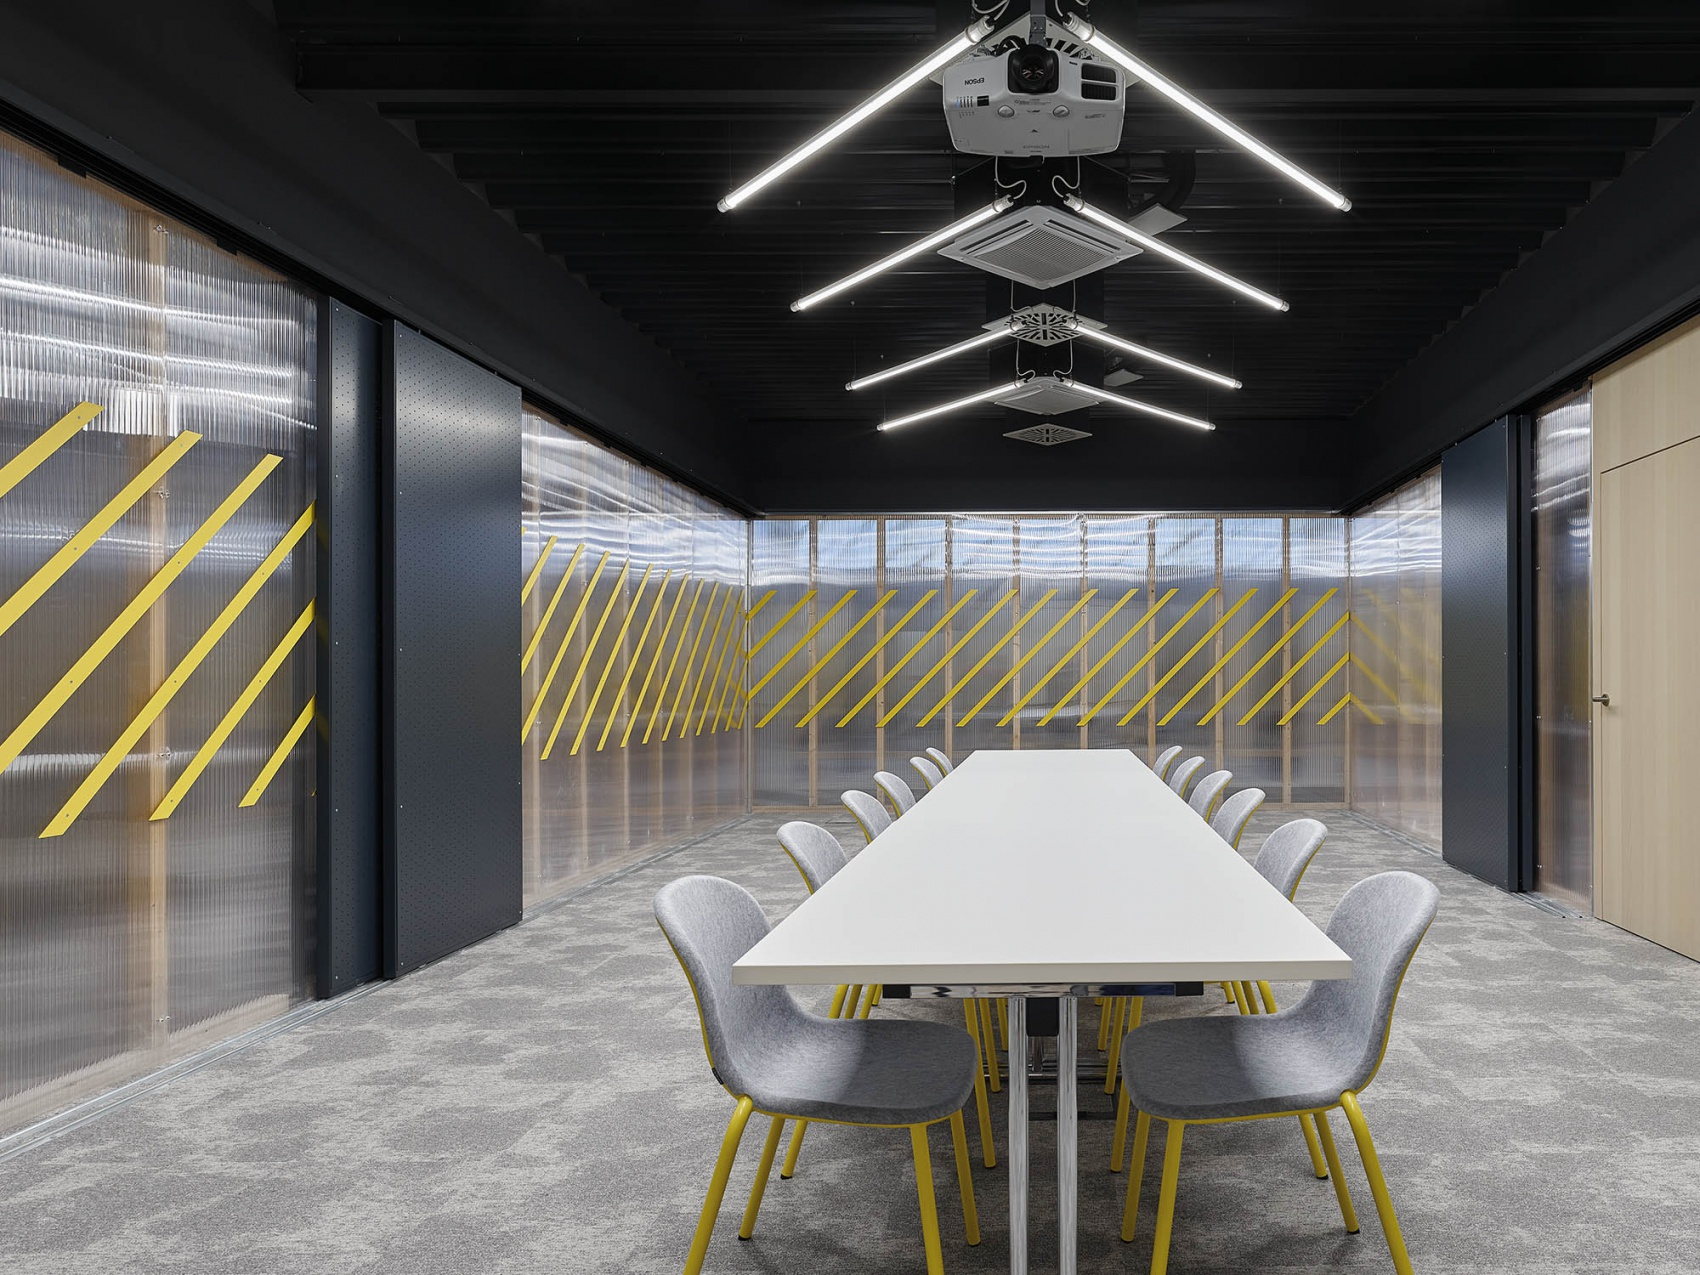 DeVorm-Projects-BoschAS-StudioAlexanderFehre-06-XL